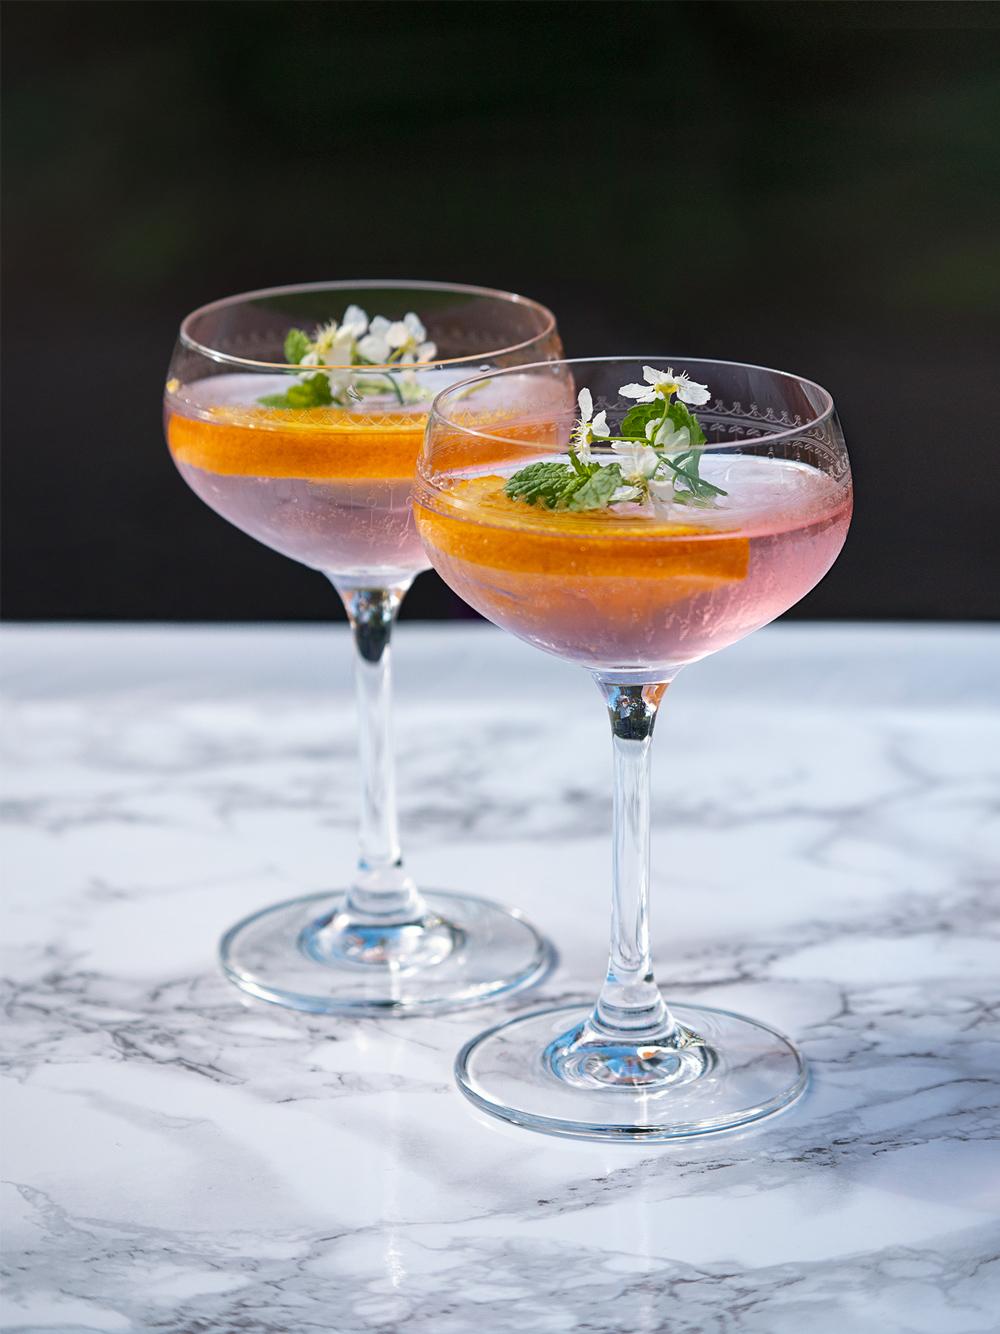 two glasses of an Elderflower Wine Aperol Spritz